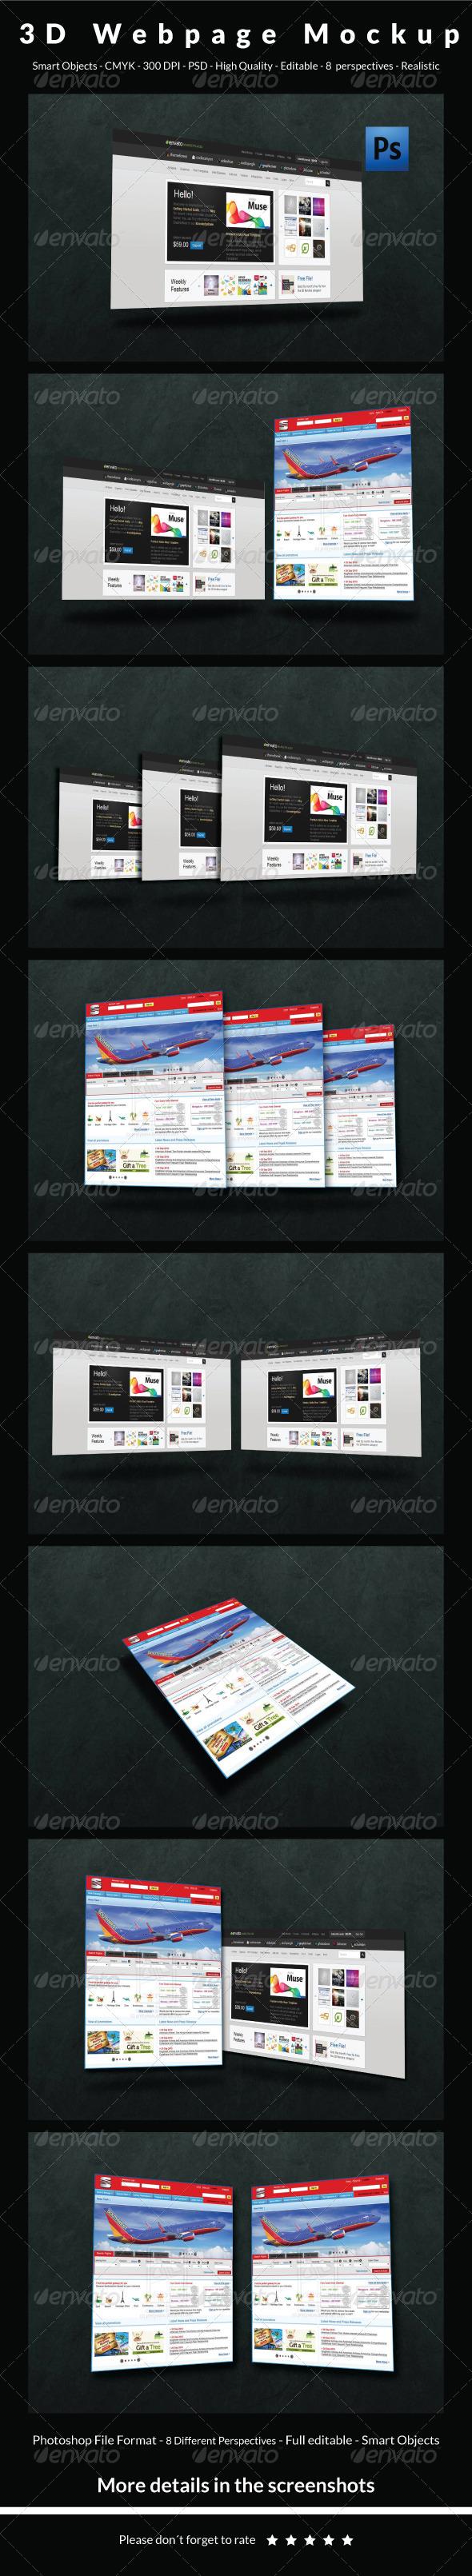 GraphicRiver 3D Webpage Mockup 6387713